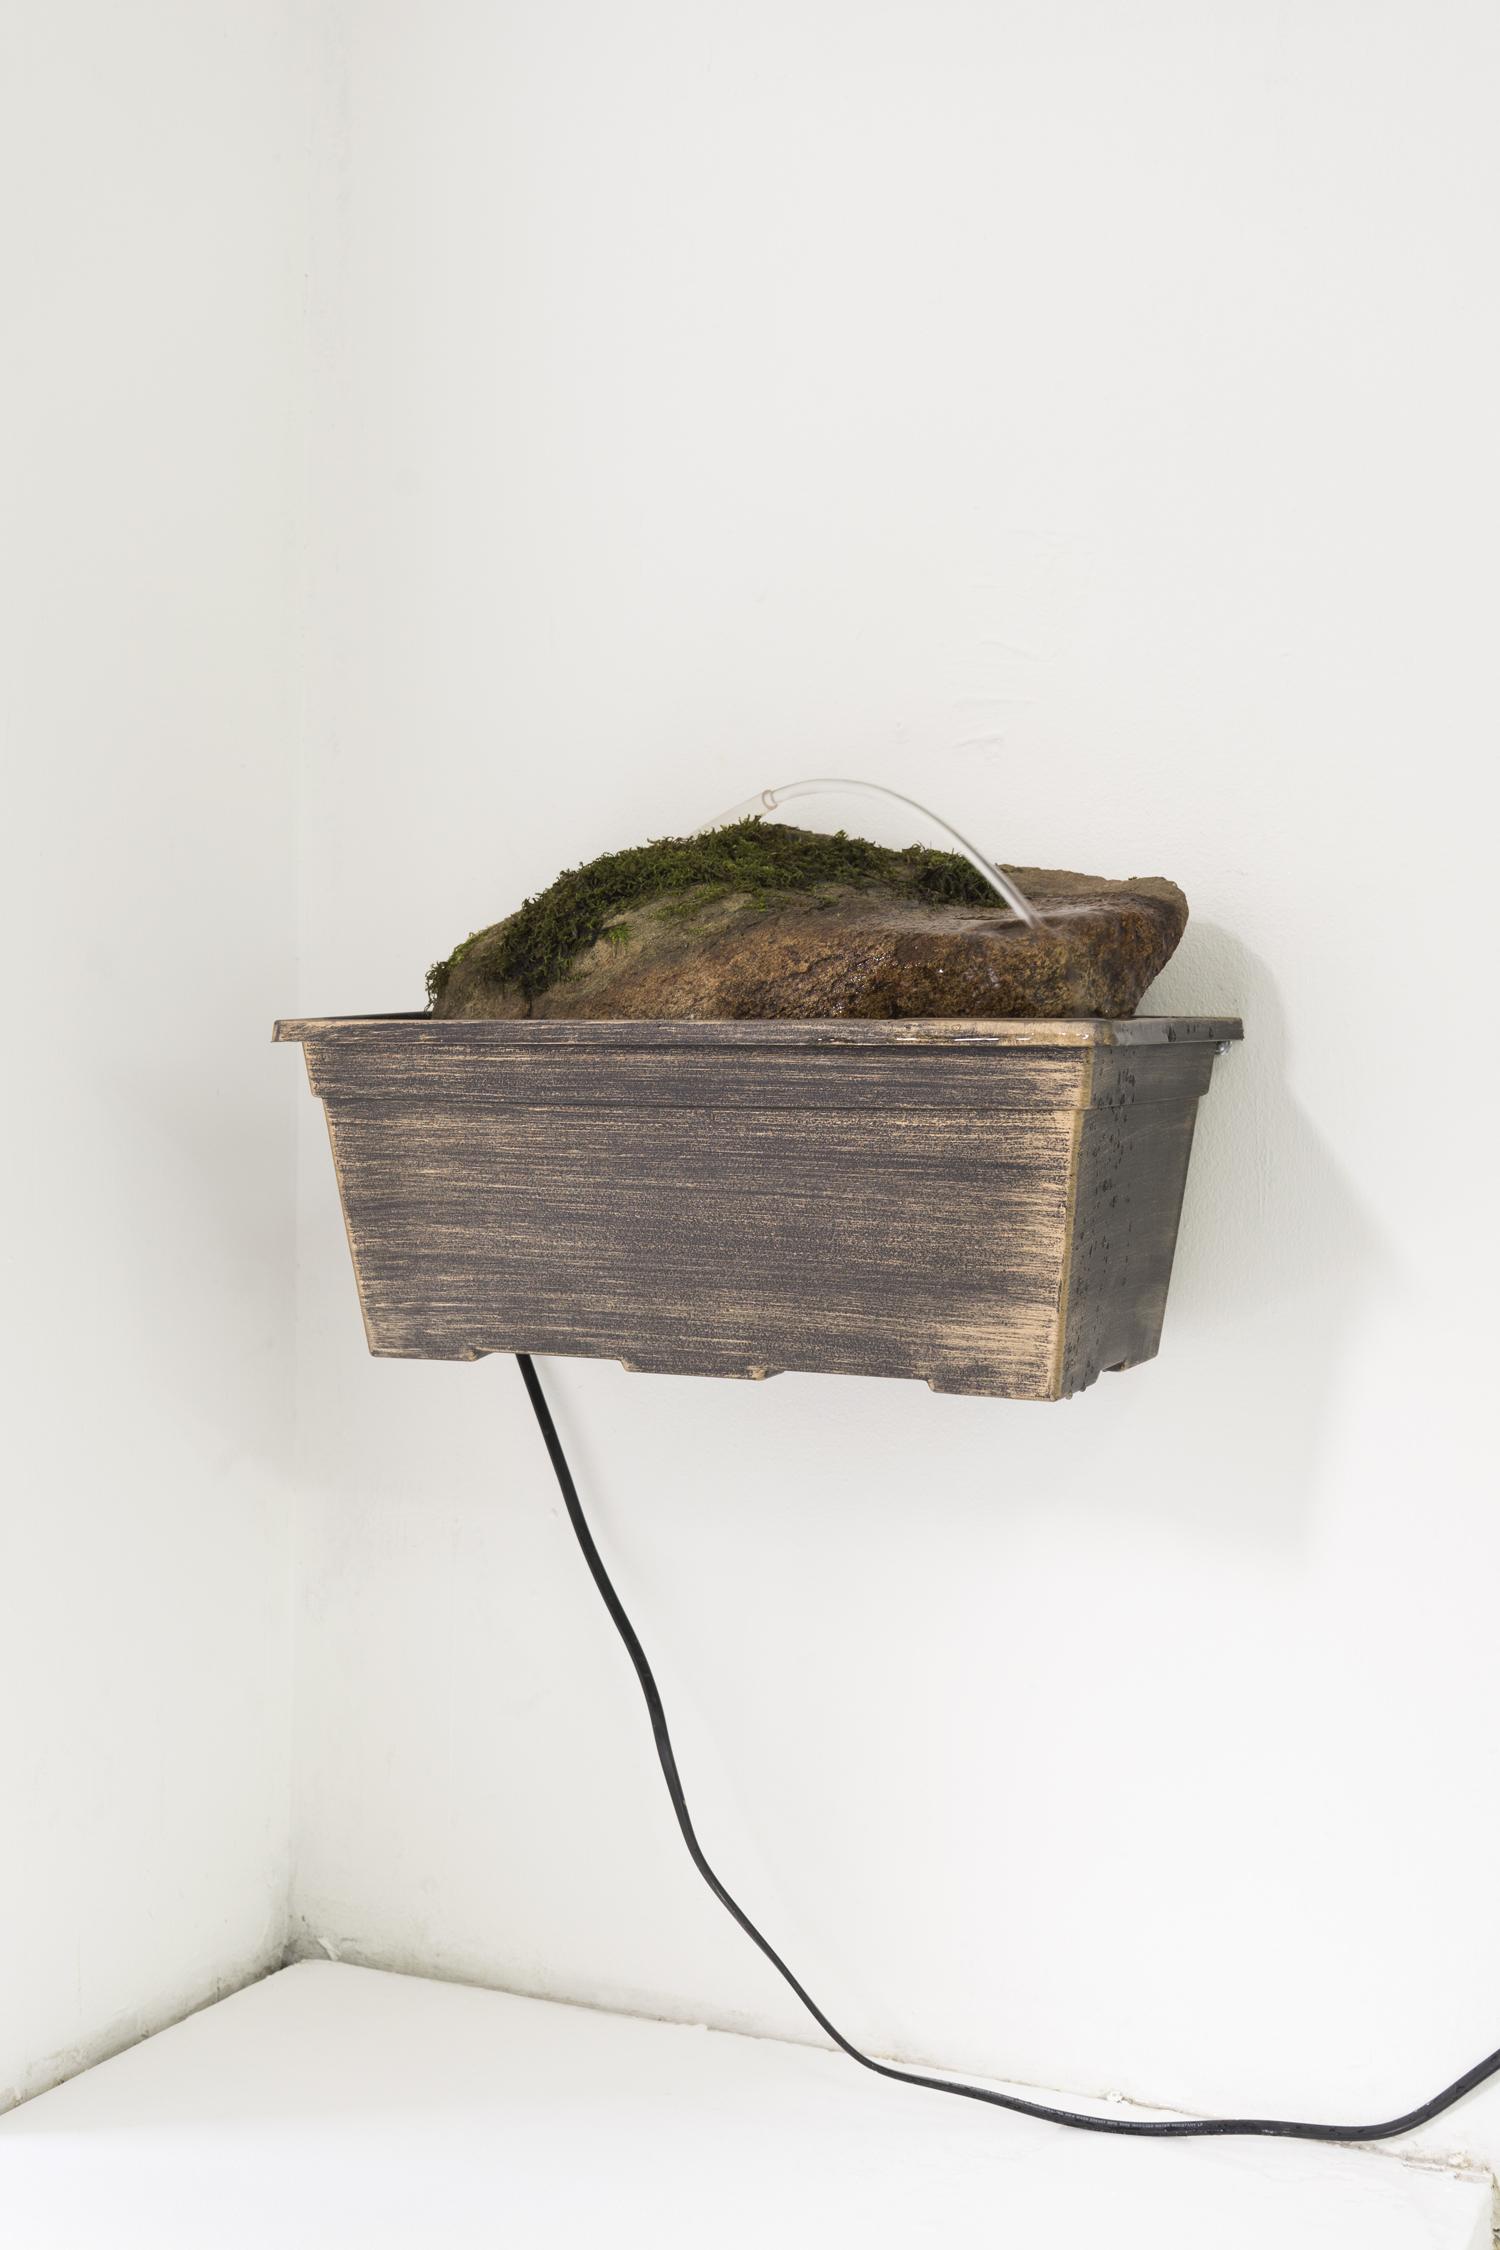 Ben Morgan-Cleveland,    Soothing Waterfall 1 , 2018, plastic basin, tubing, rocks, recirculating water pump, metal shelving brackets, water, 9 × 15 × 8 inches